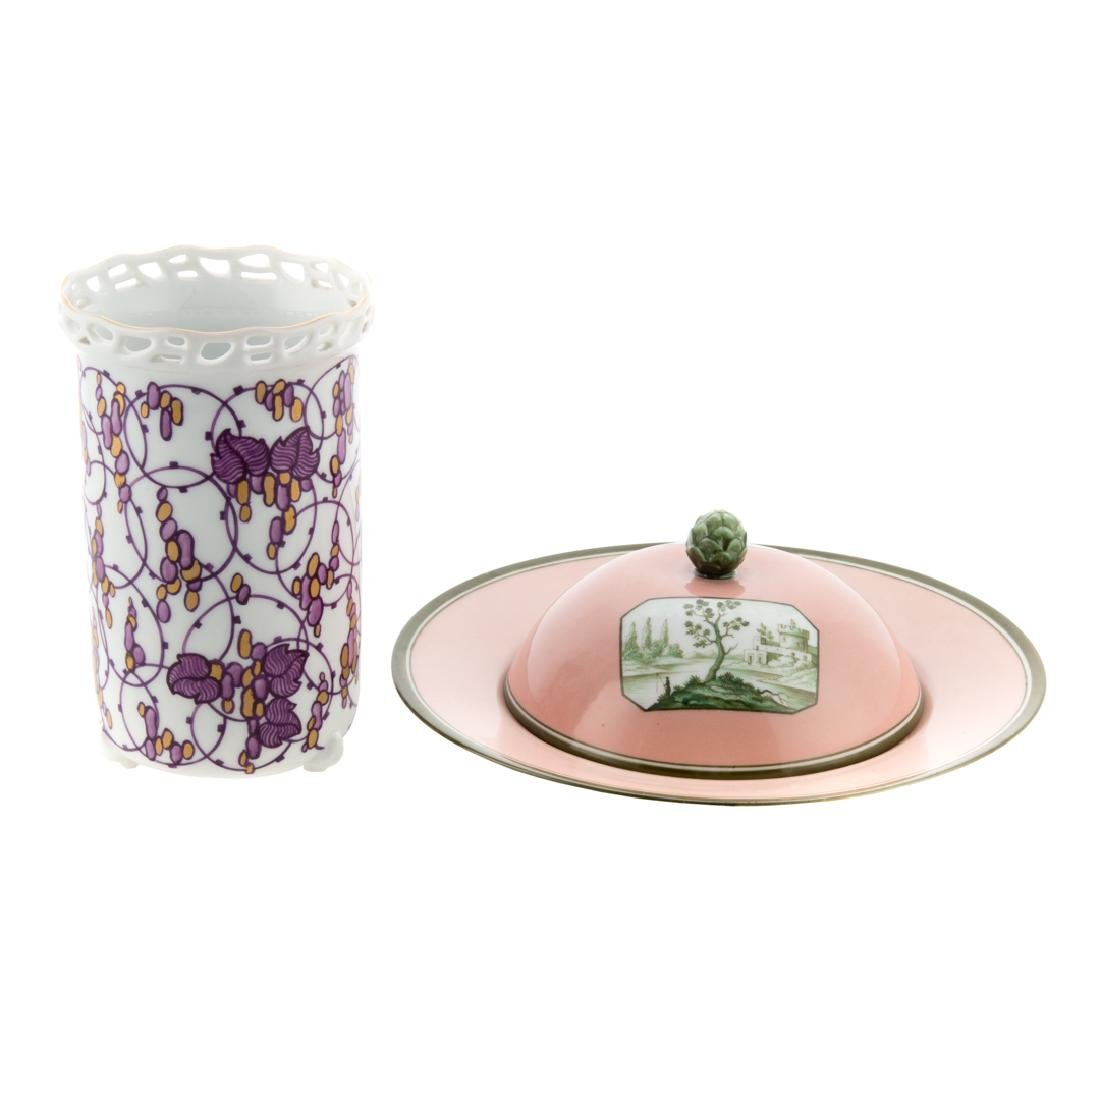 Two Nymphenburg porcelain articles